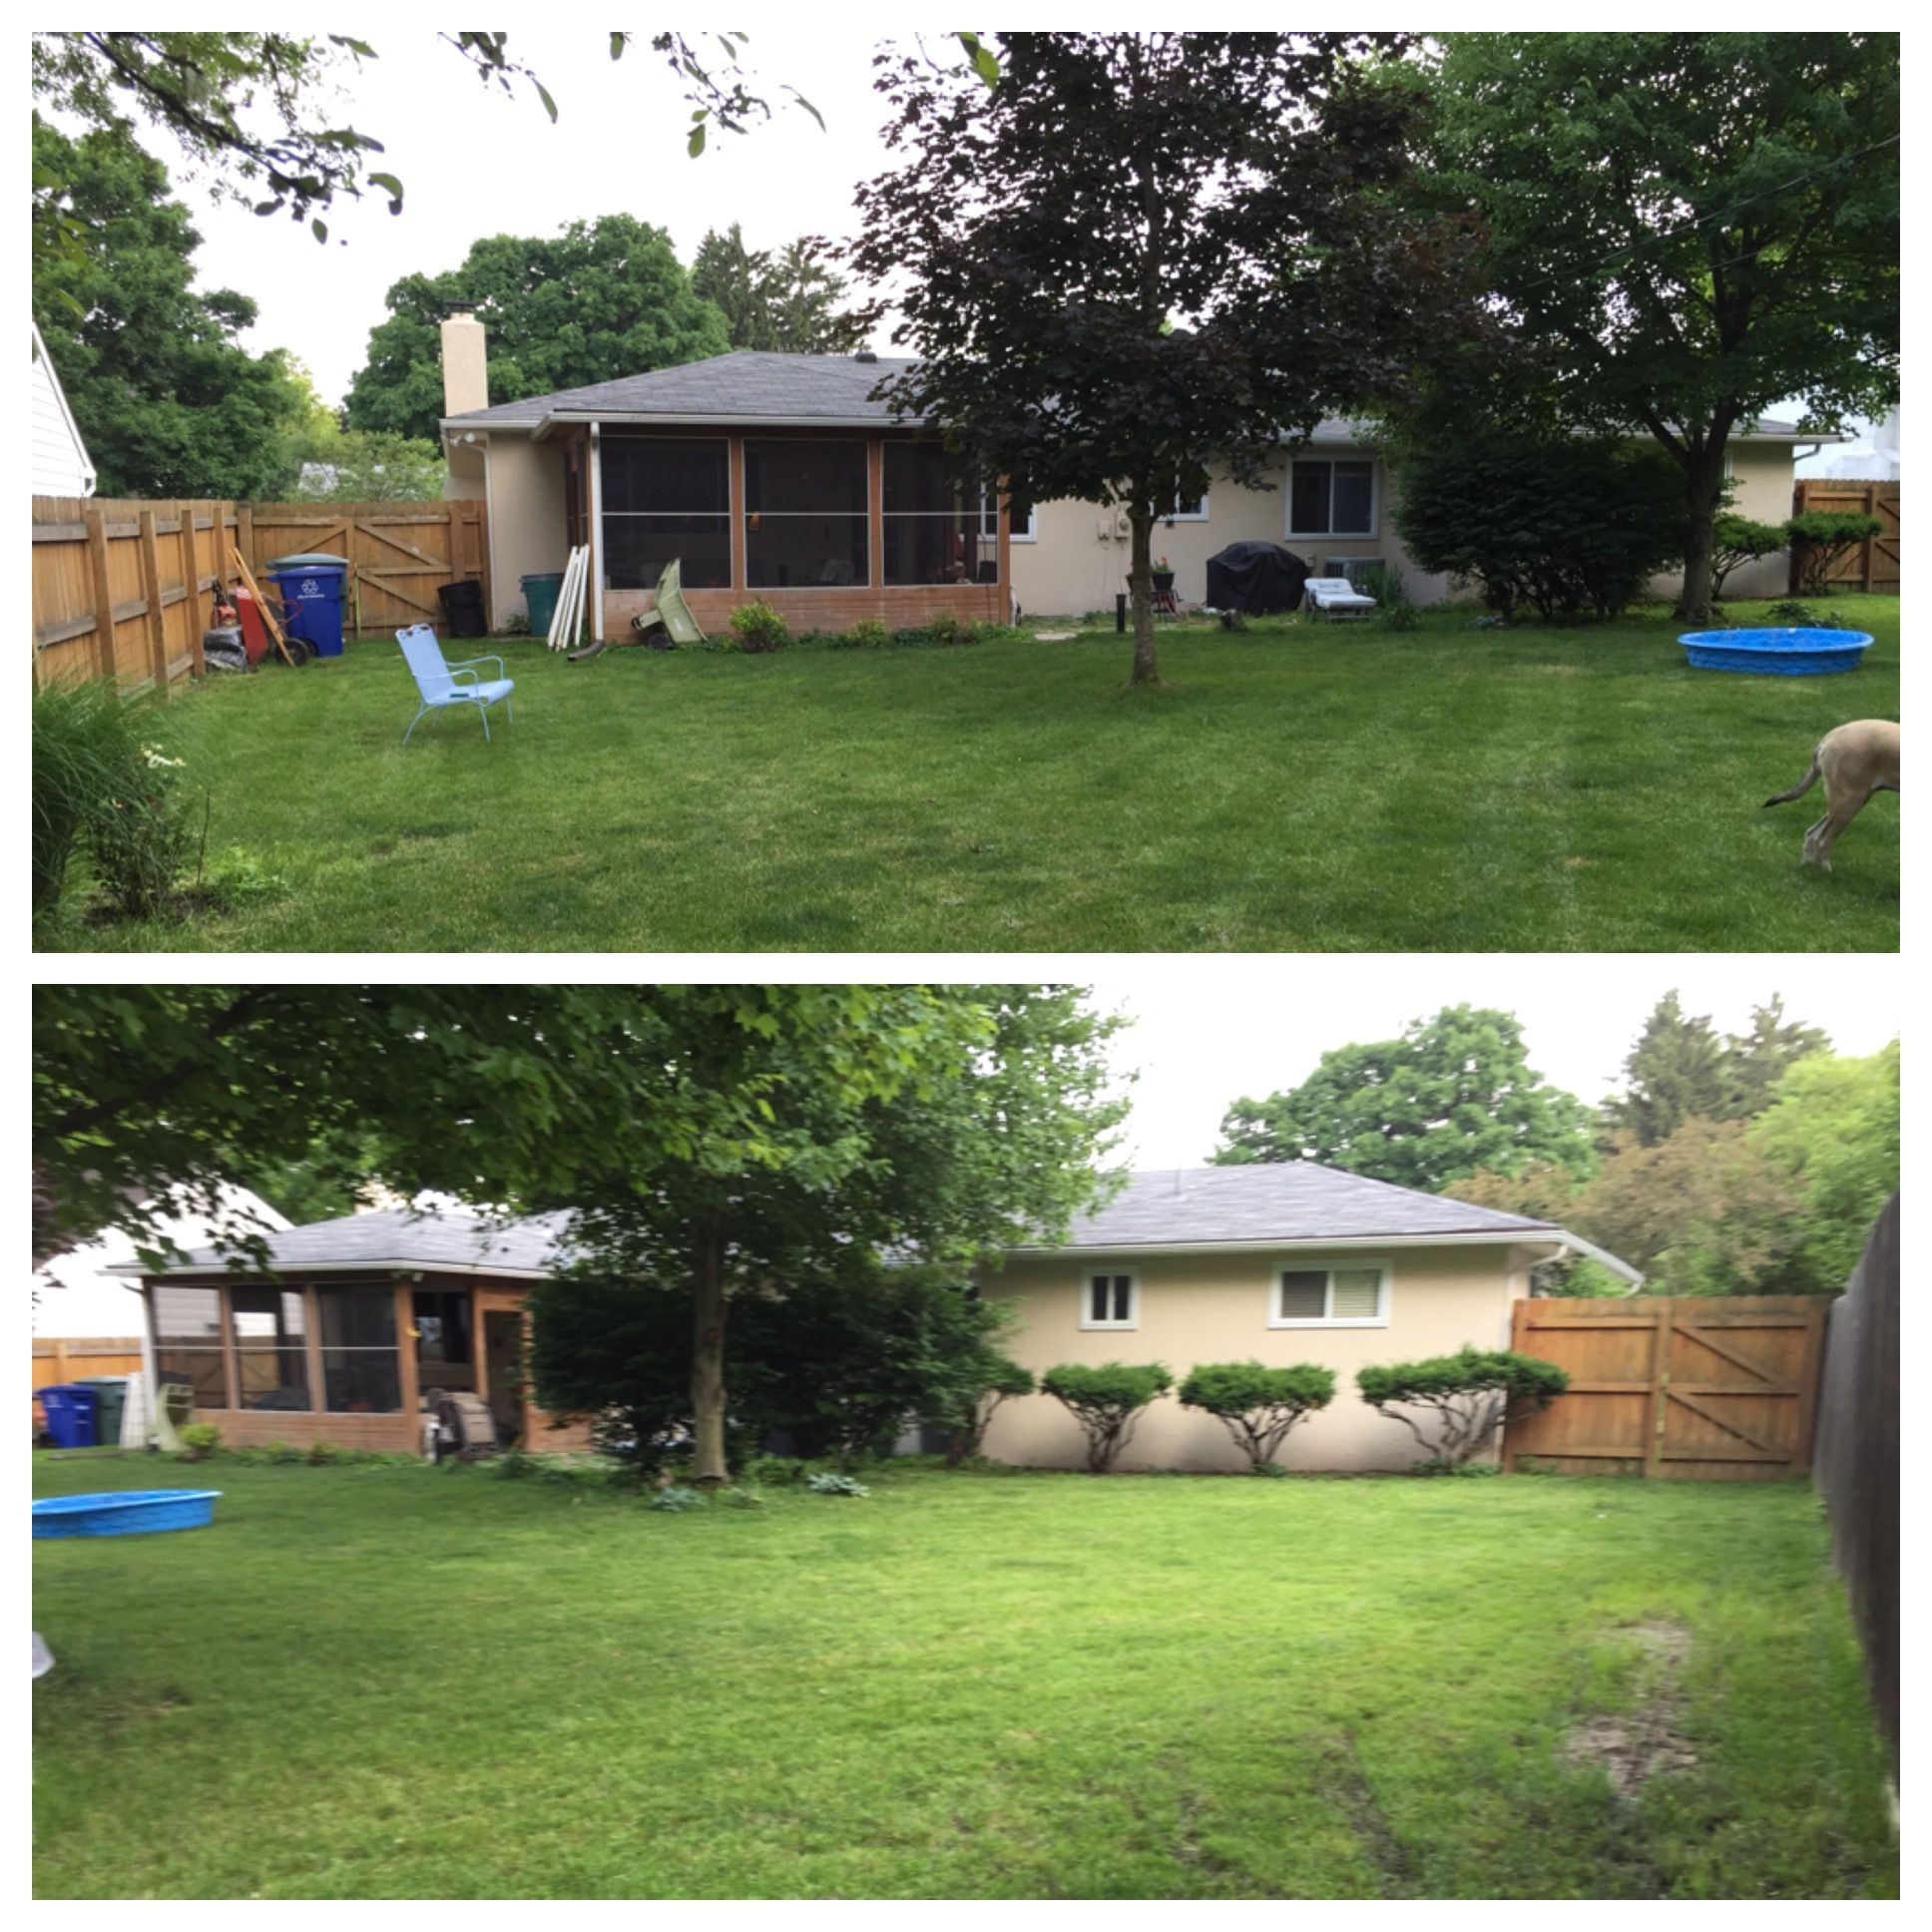 My current backyard.  #PinMyDreamBackyard